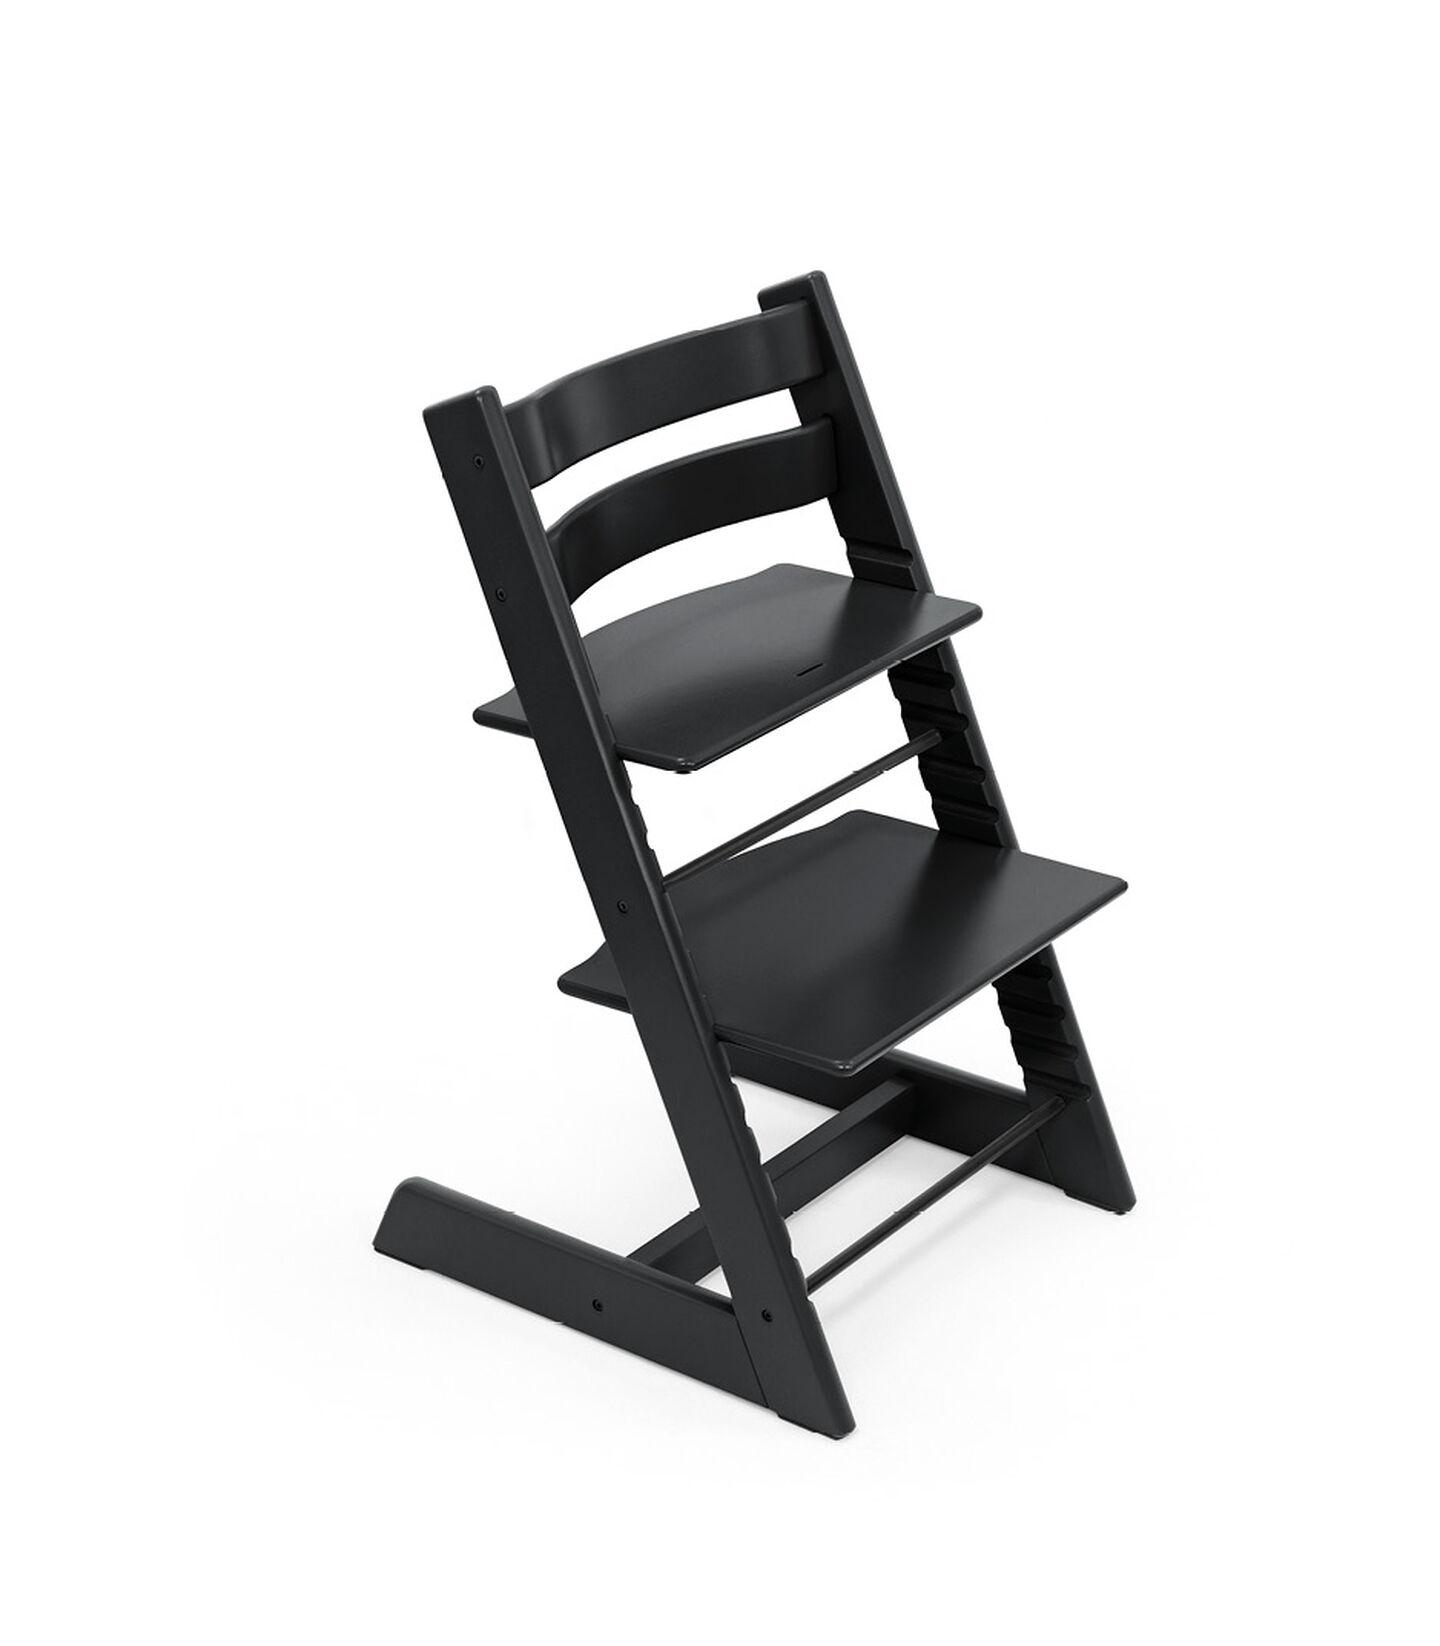 Tripp Trapp® chair Black, Beech Wood. view 2